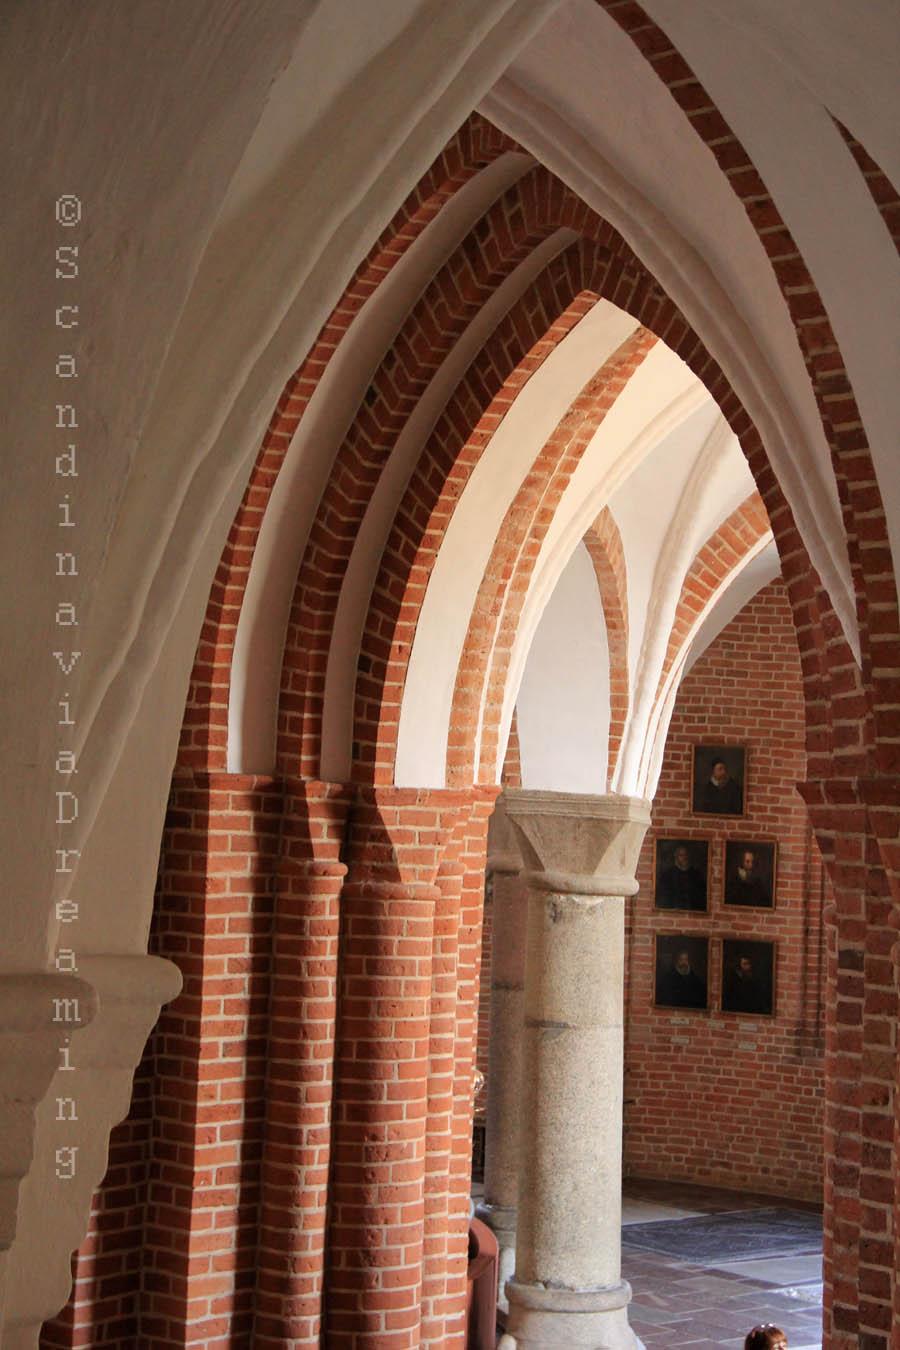 Voûtes en ogives à la cathédrale de Roskilde